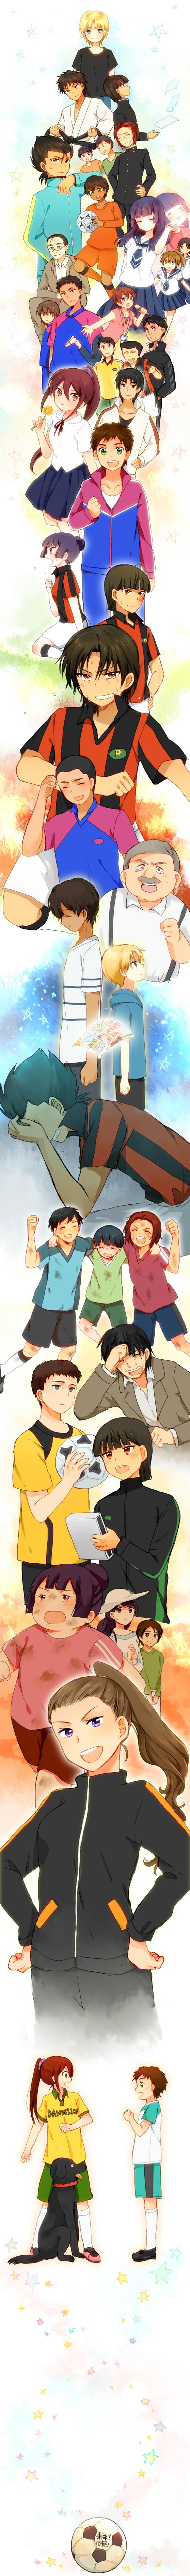 Tags: Anime, Nuka, Ginga e Kickoff!!, Saionji Reika, Oota Shou, Furuya Ouzou, Hanashima Masaru, Takatoo Erika, Kageura Akira, Sugiyama Tagi, Saionji Kimie, Furuya Kota, Uchimura Katsura